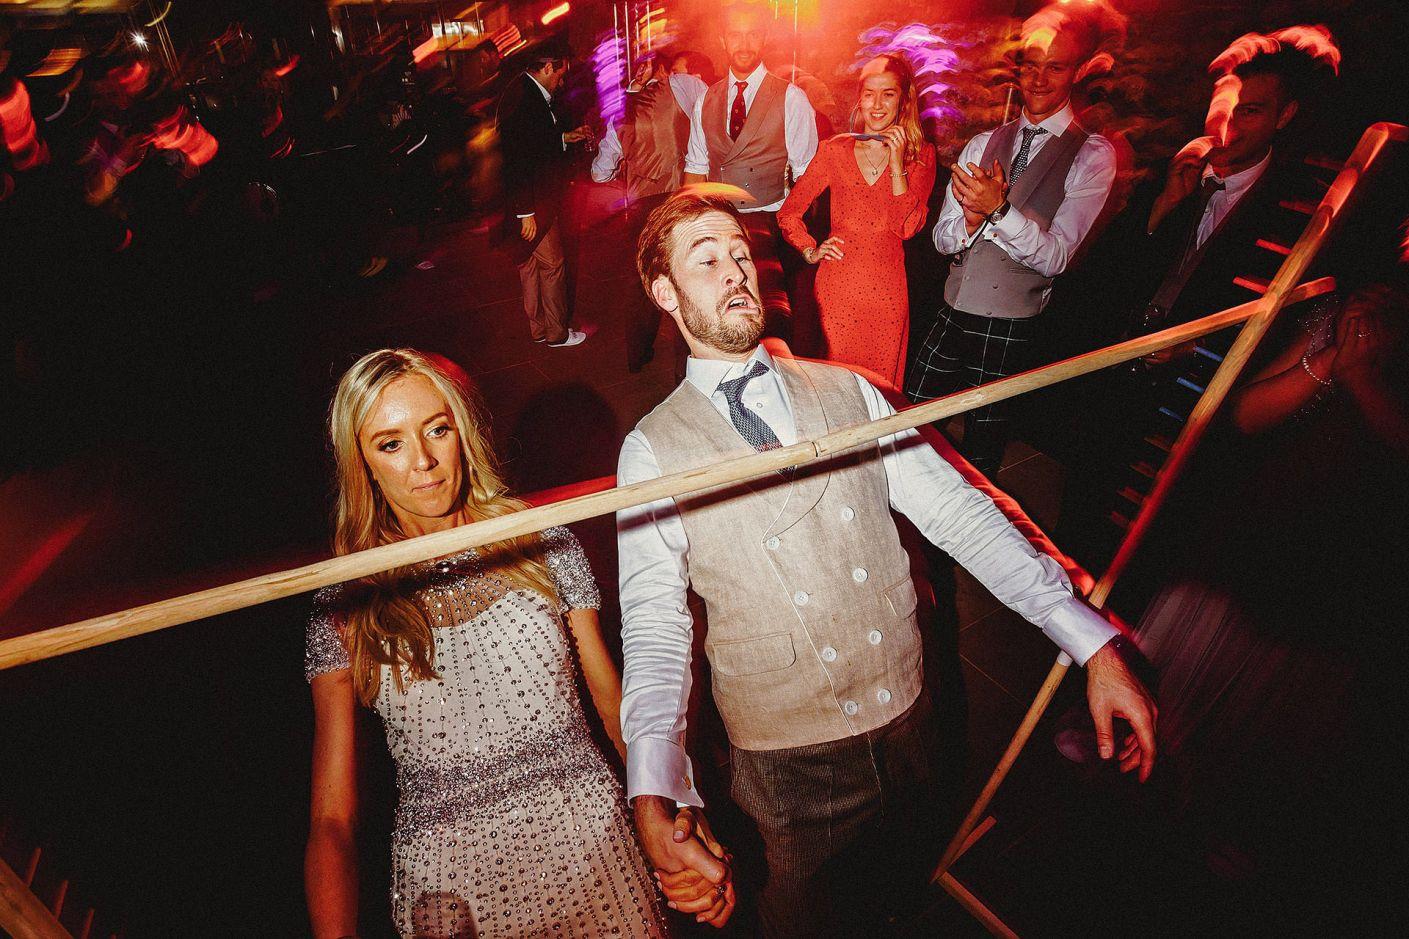 bride and groom limbo dancing